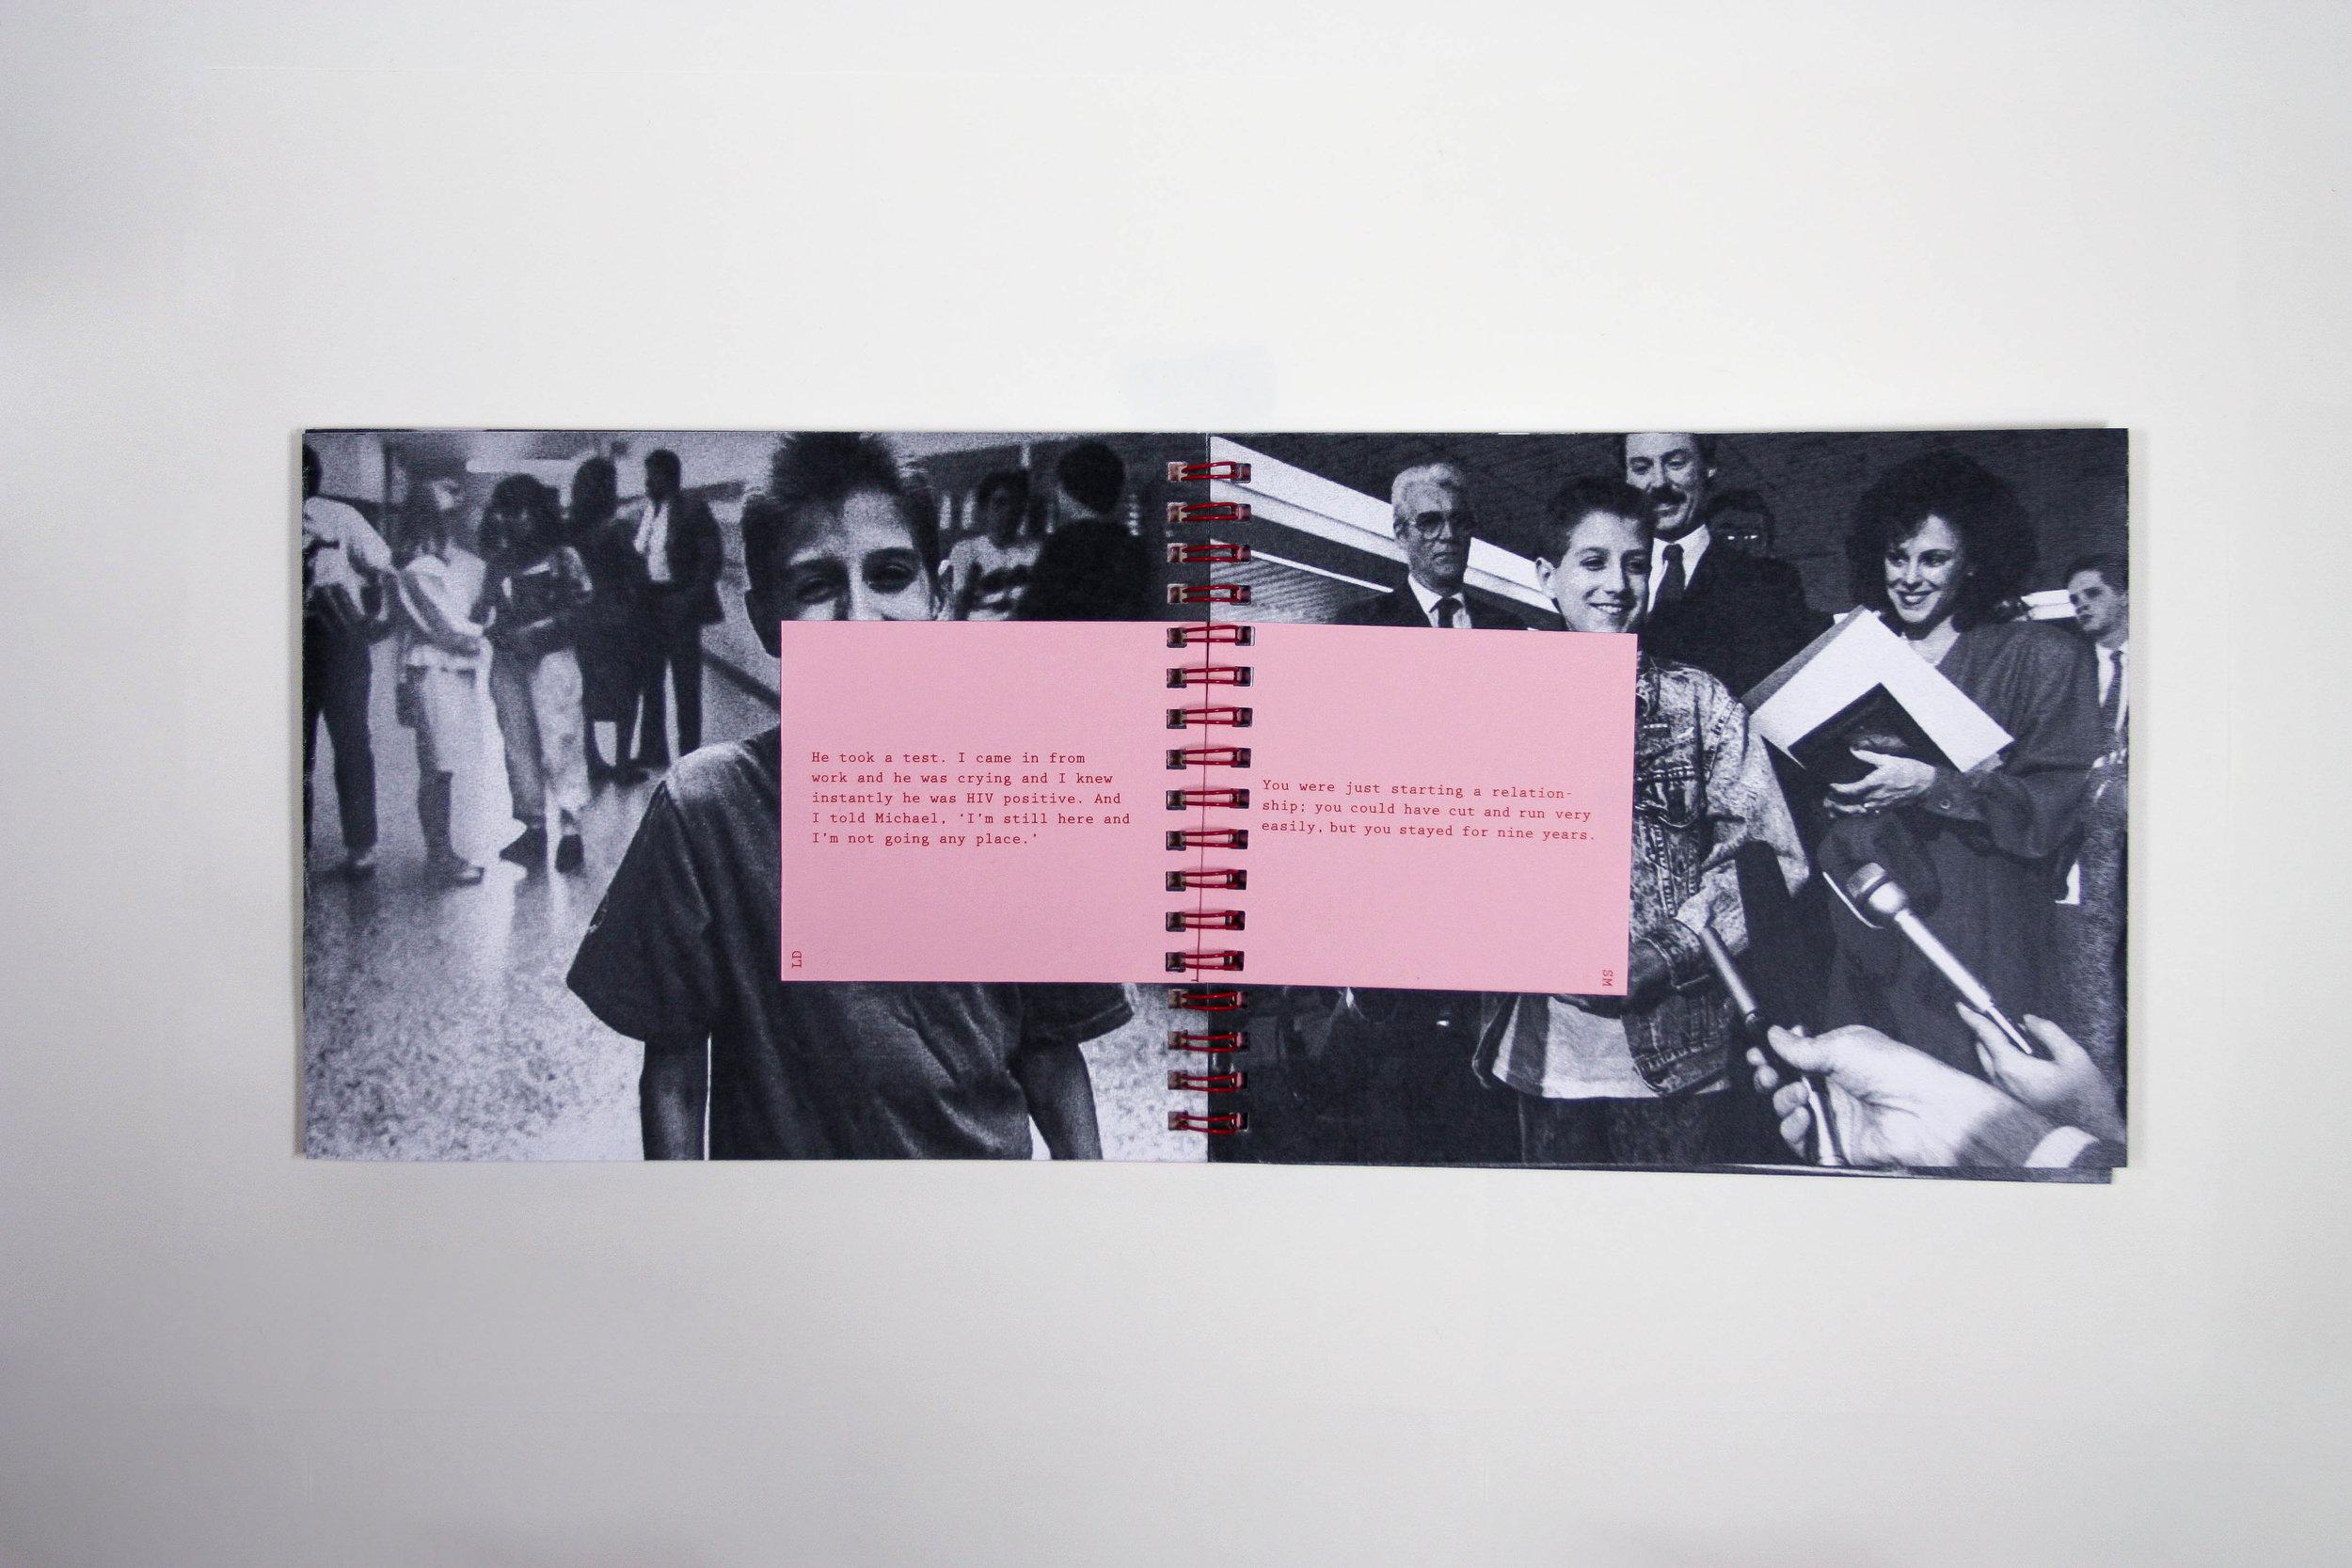 estory-bookimages-10.jpg